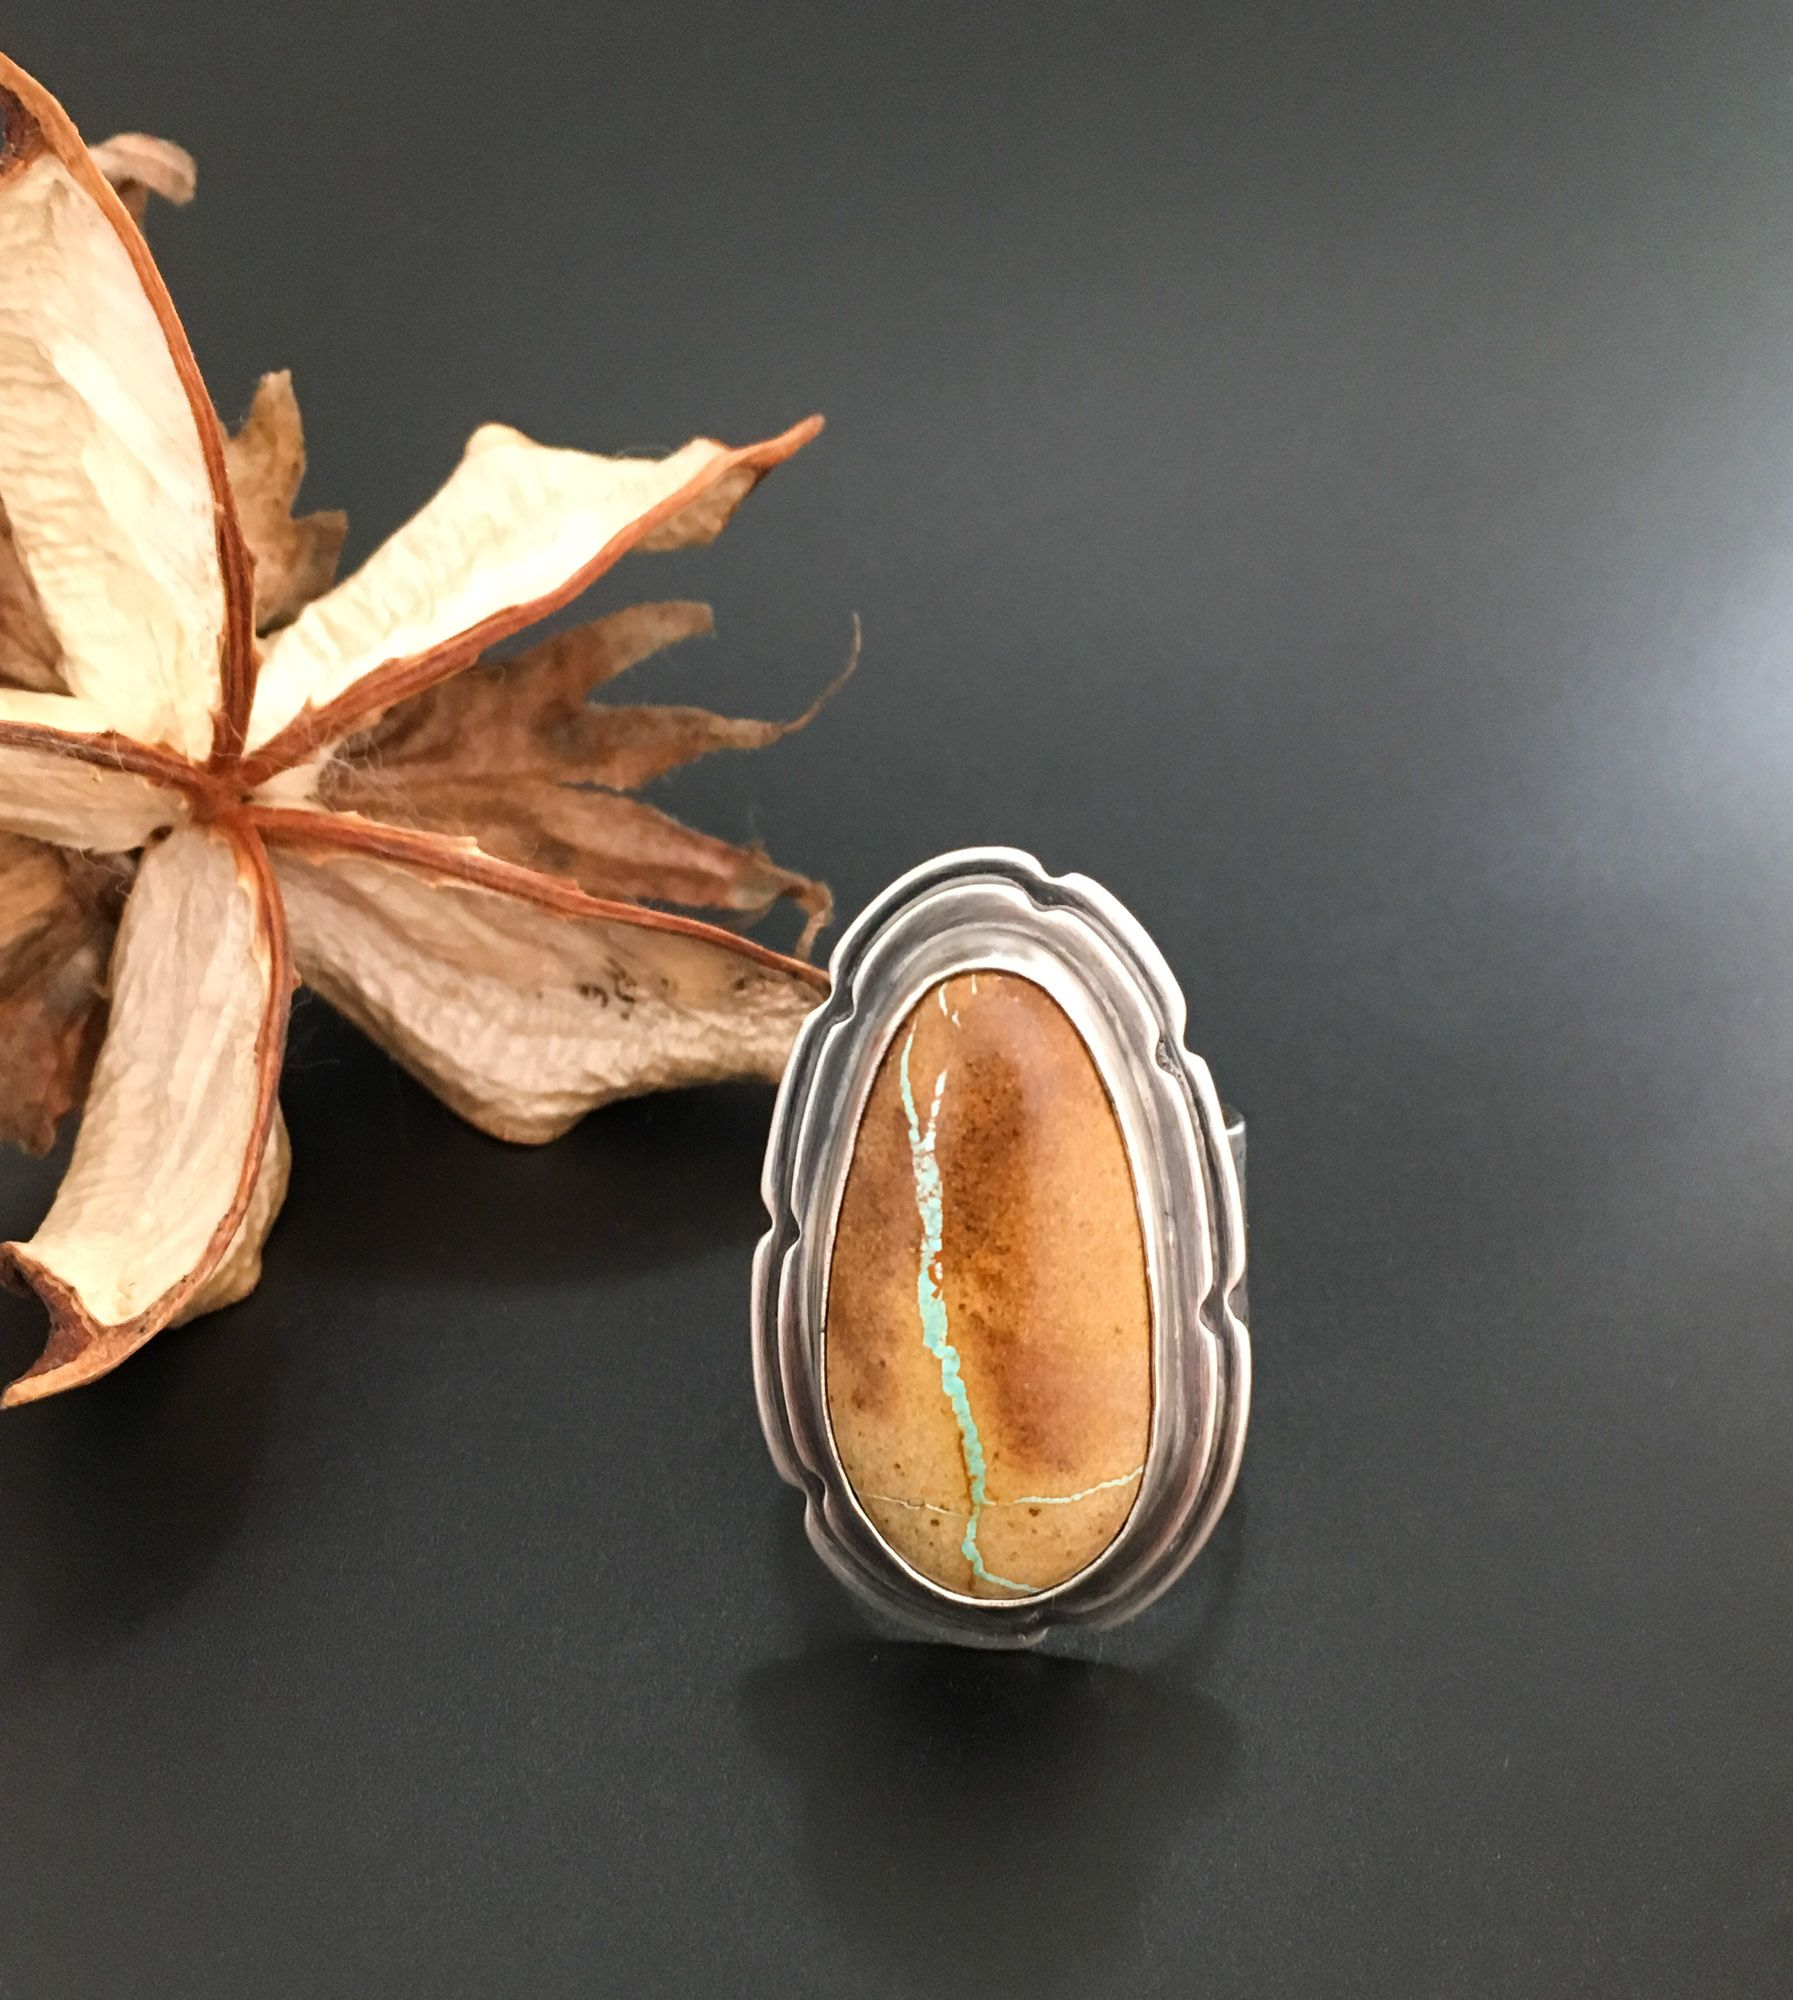 Sharon Rene Jewelry - Ribbon Turquoise Ring  www.sharonrenejewelry.etsy.com